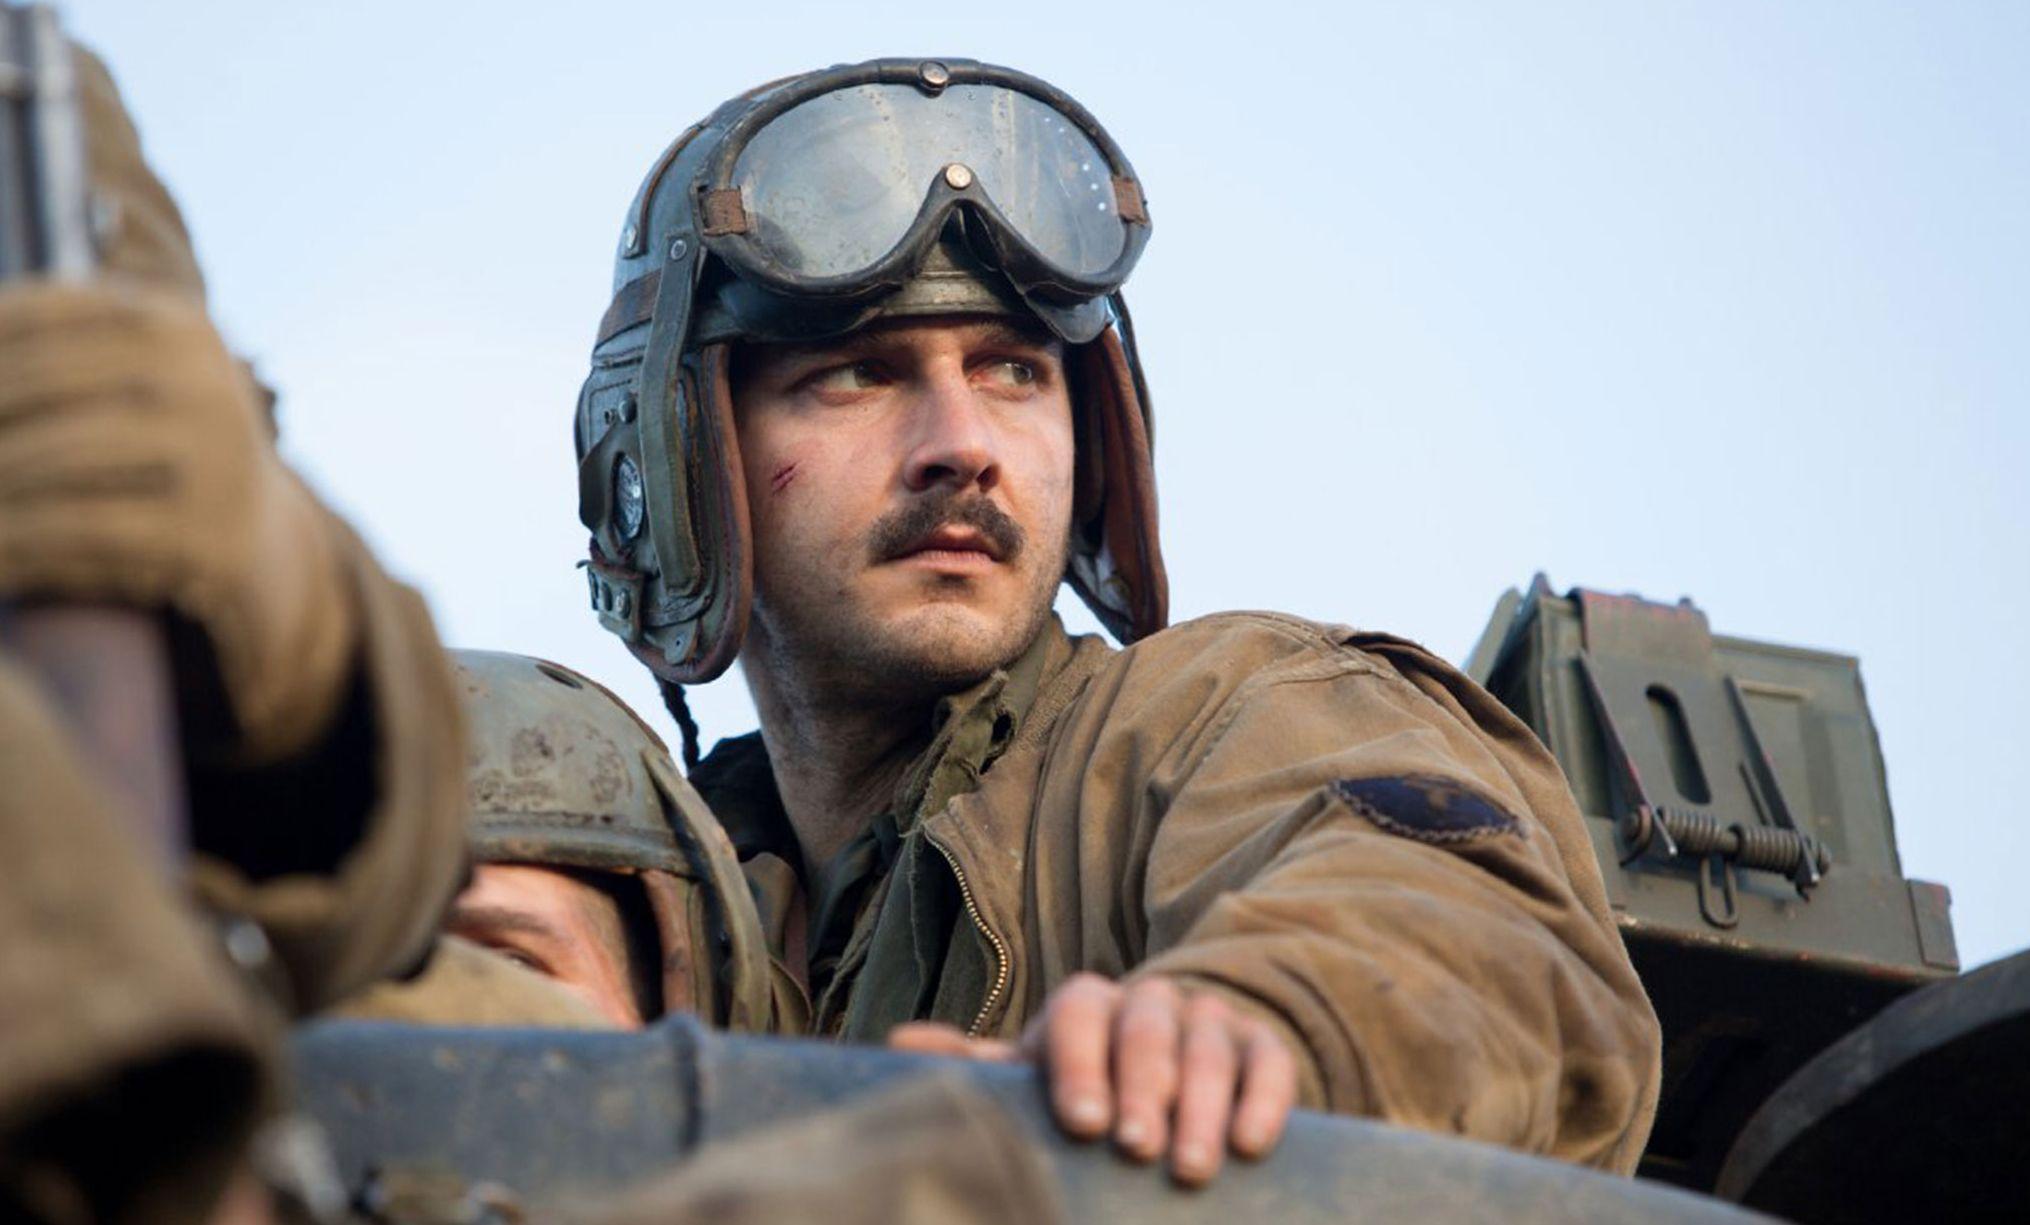 Shia LaBeouf close-up as Bible Boyd Swan in Fury